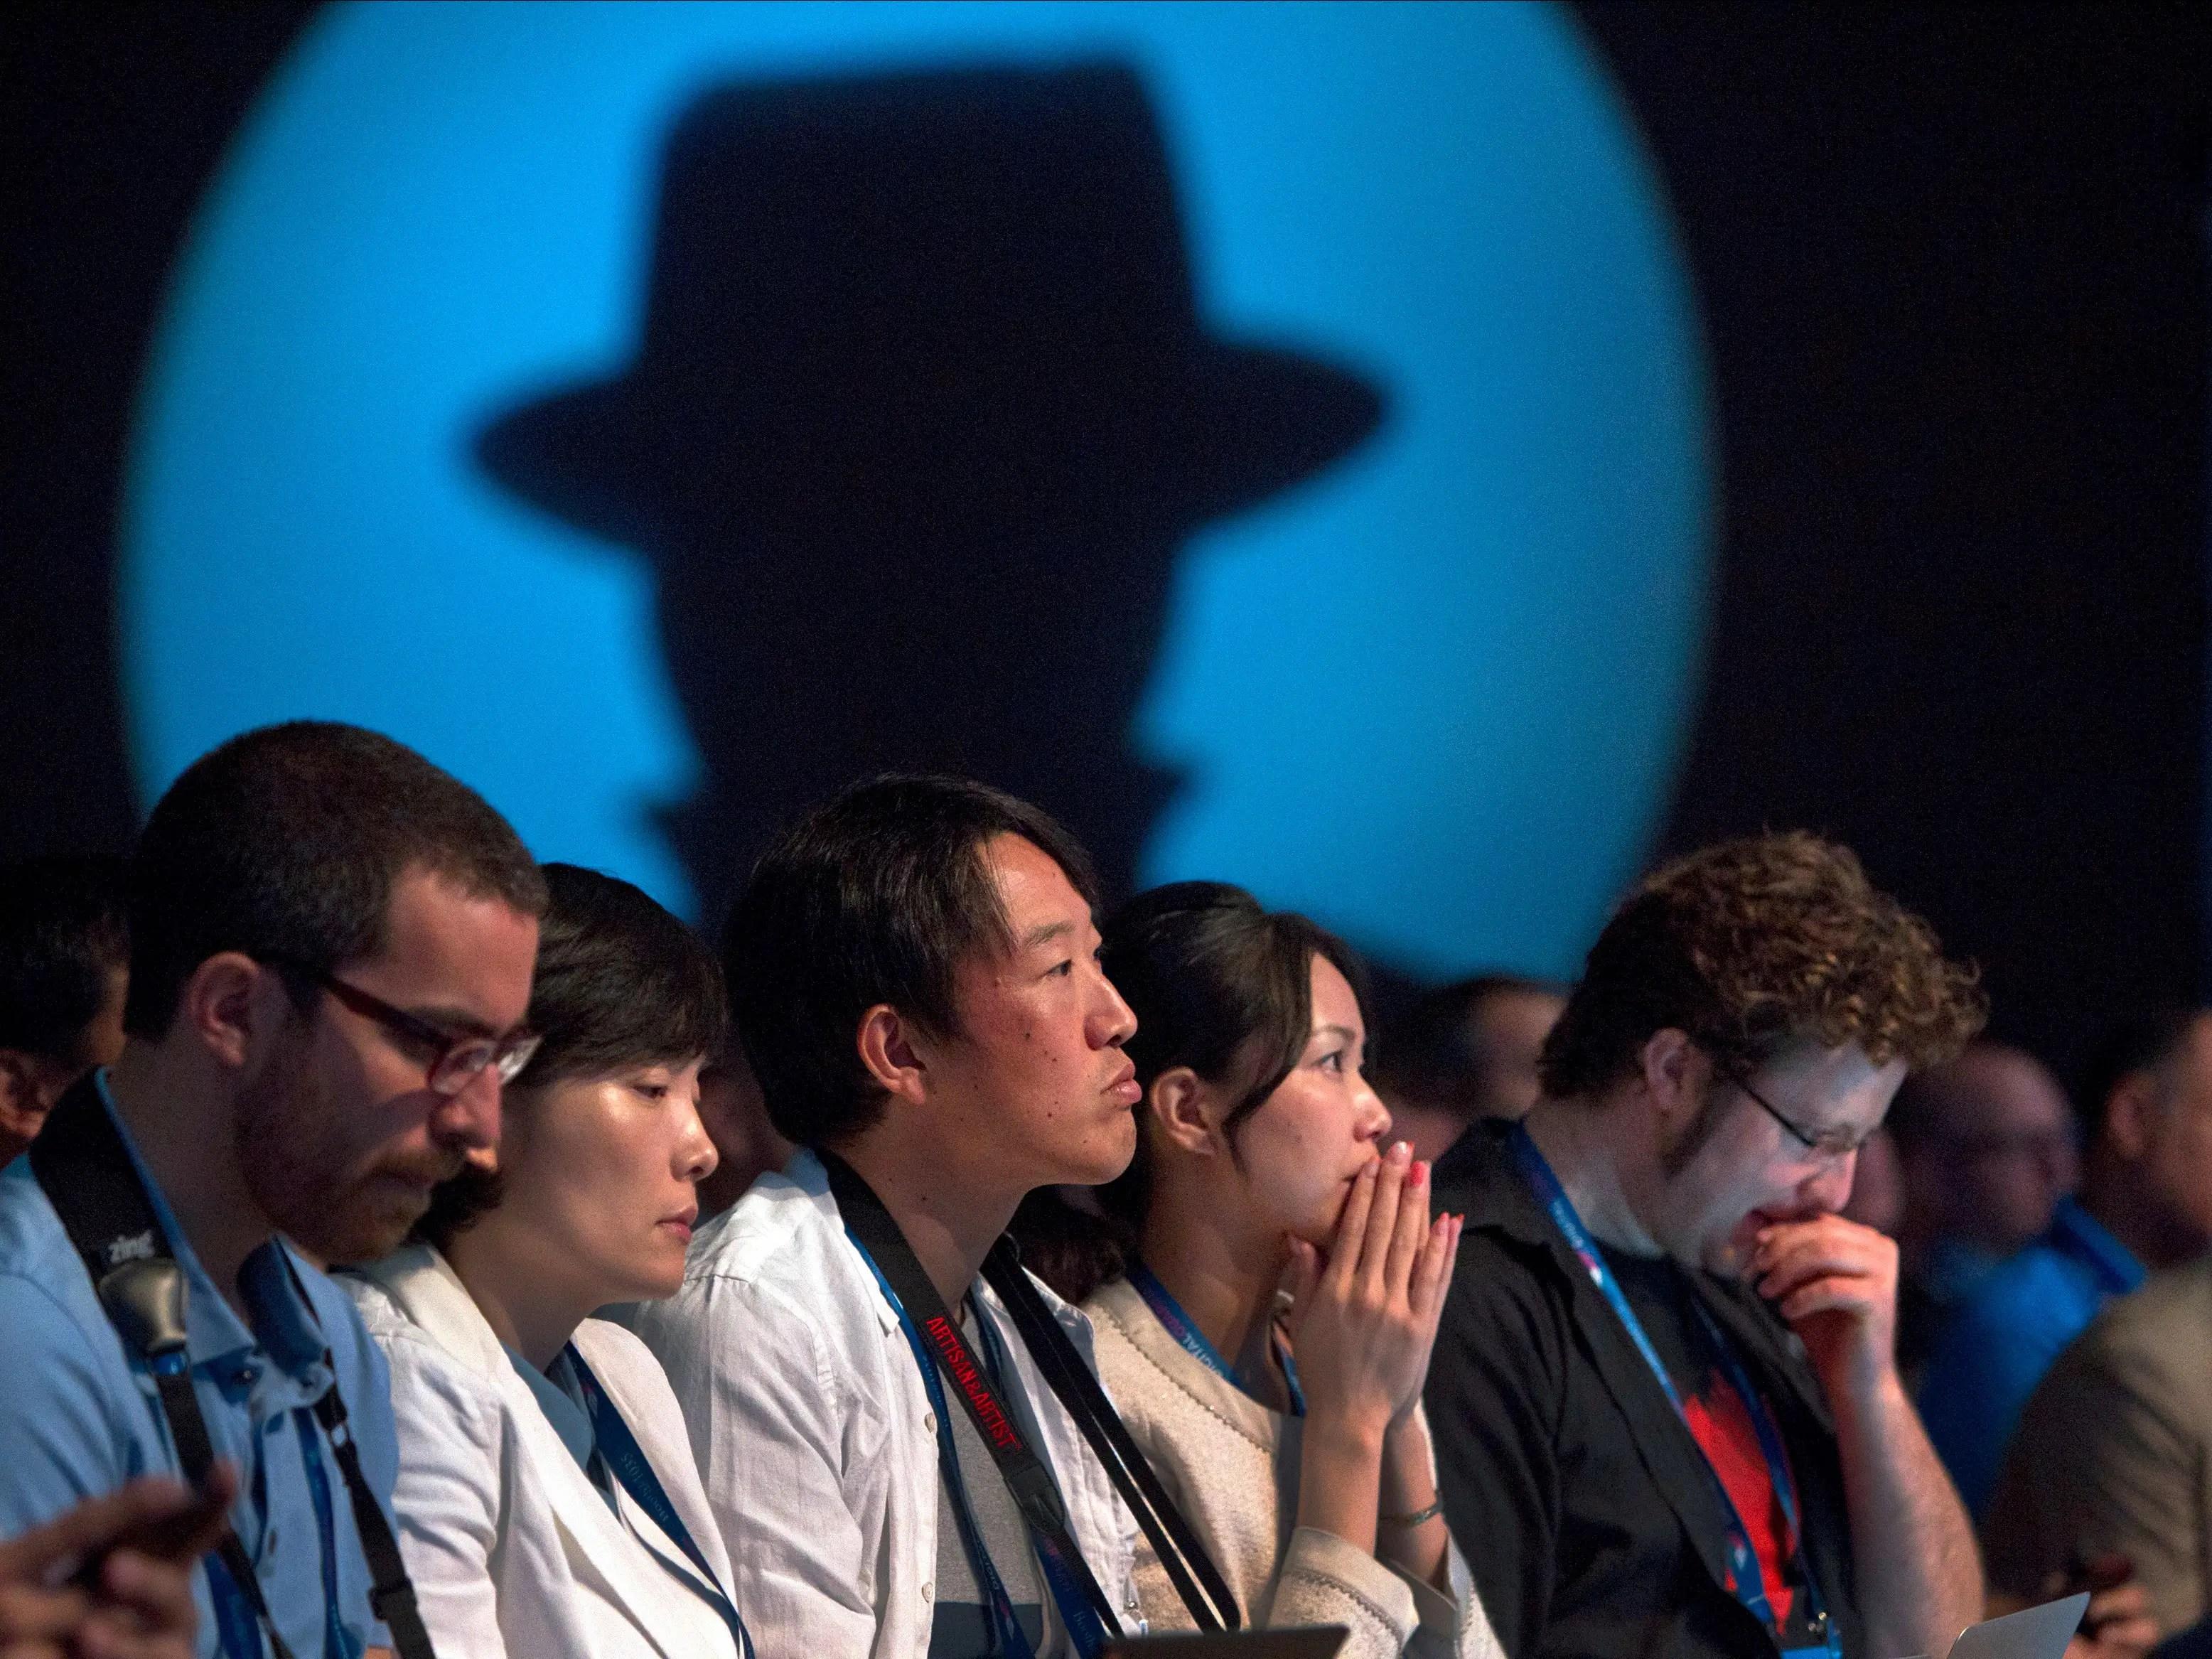 hackers america cyberattacks black hat